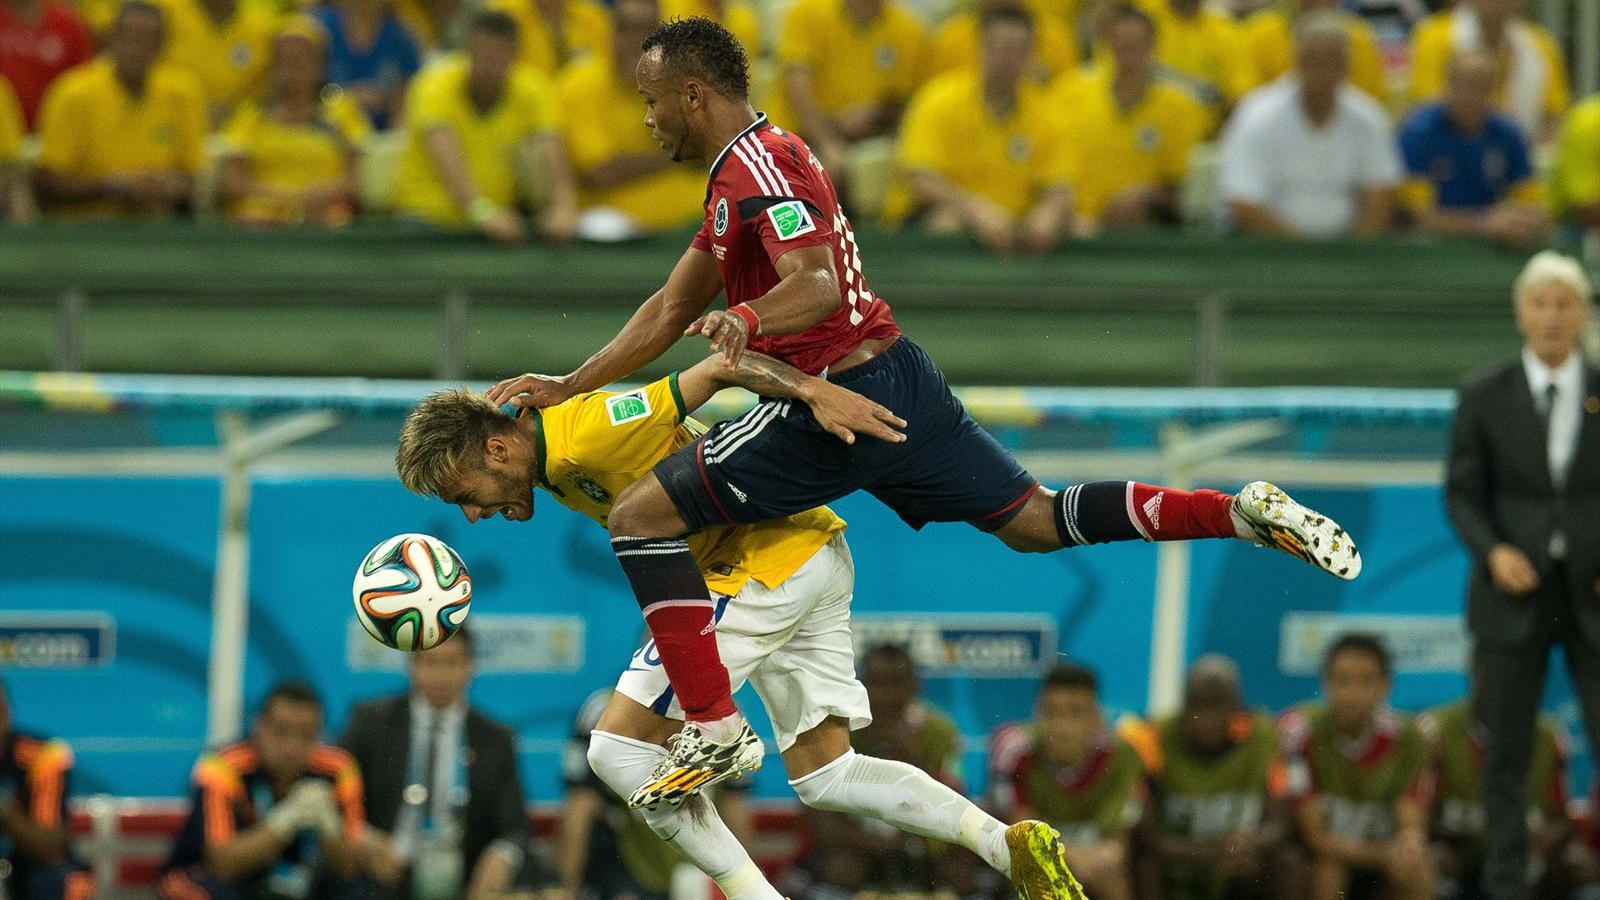 Neymar prêt à jouer la finale? La folle rumeur a fait long feu